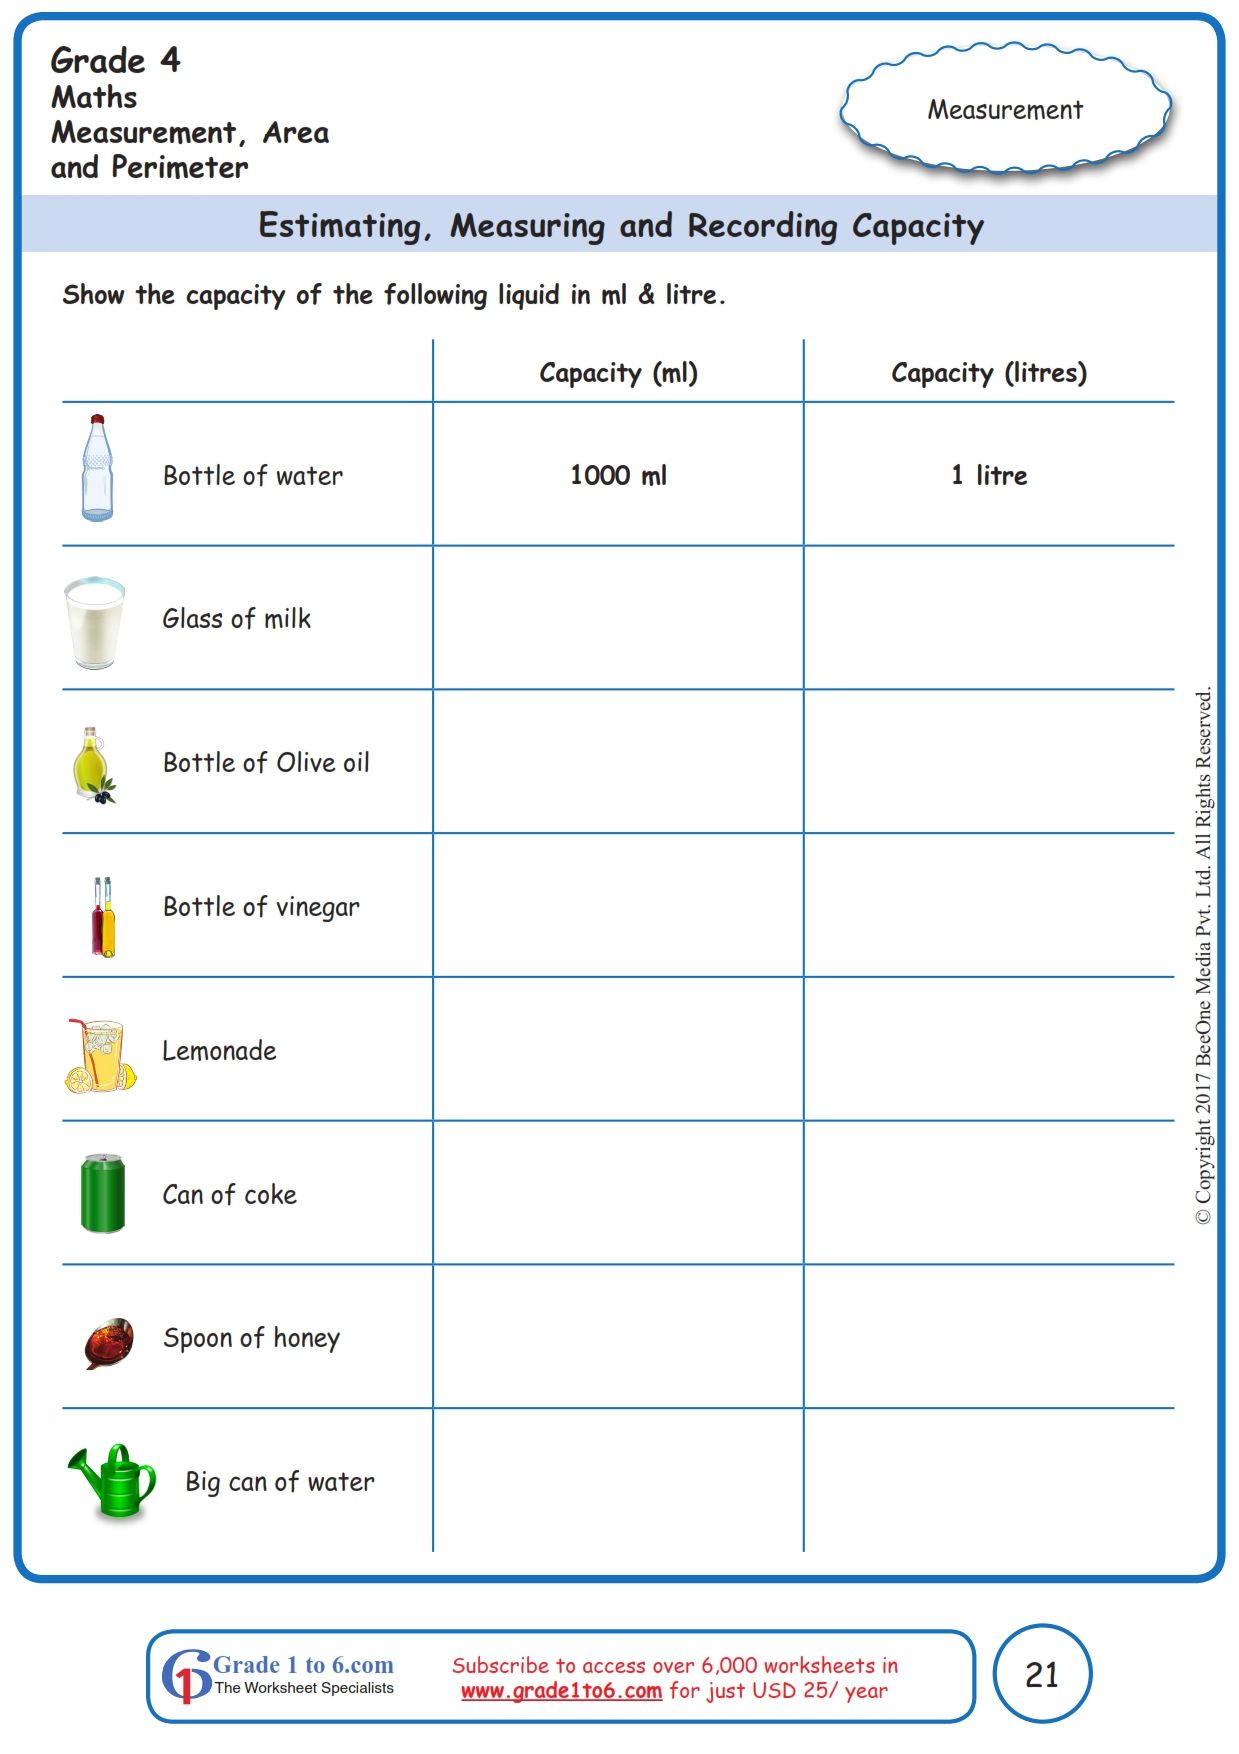 medium resolution of 120 Grade 4 Math Worksheets: PYP/CBSE/ICSE/Common Core ideas   math  worksheets